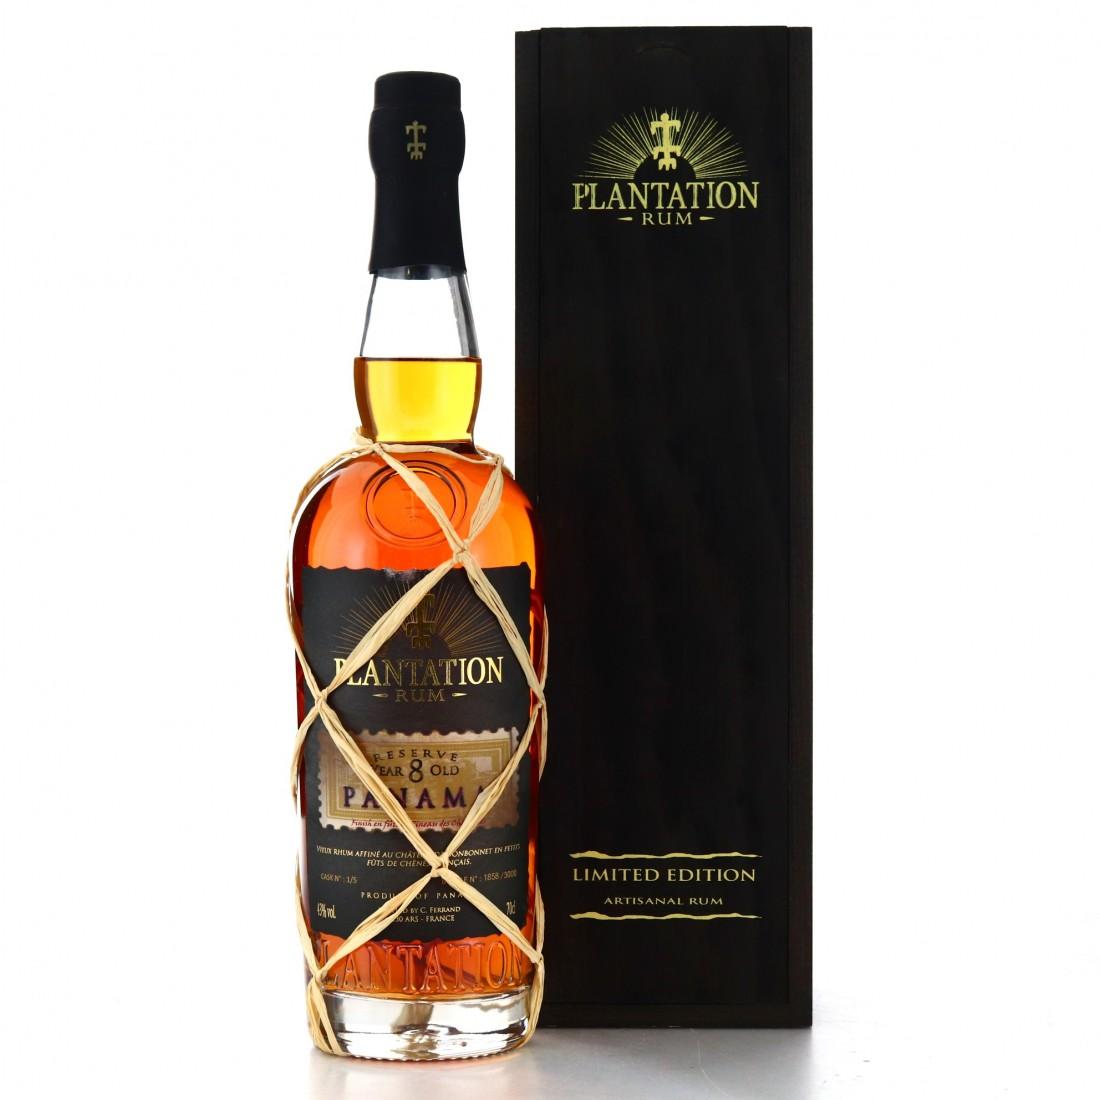 Panama Rum 8 Year Old Plantation